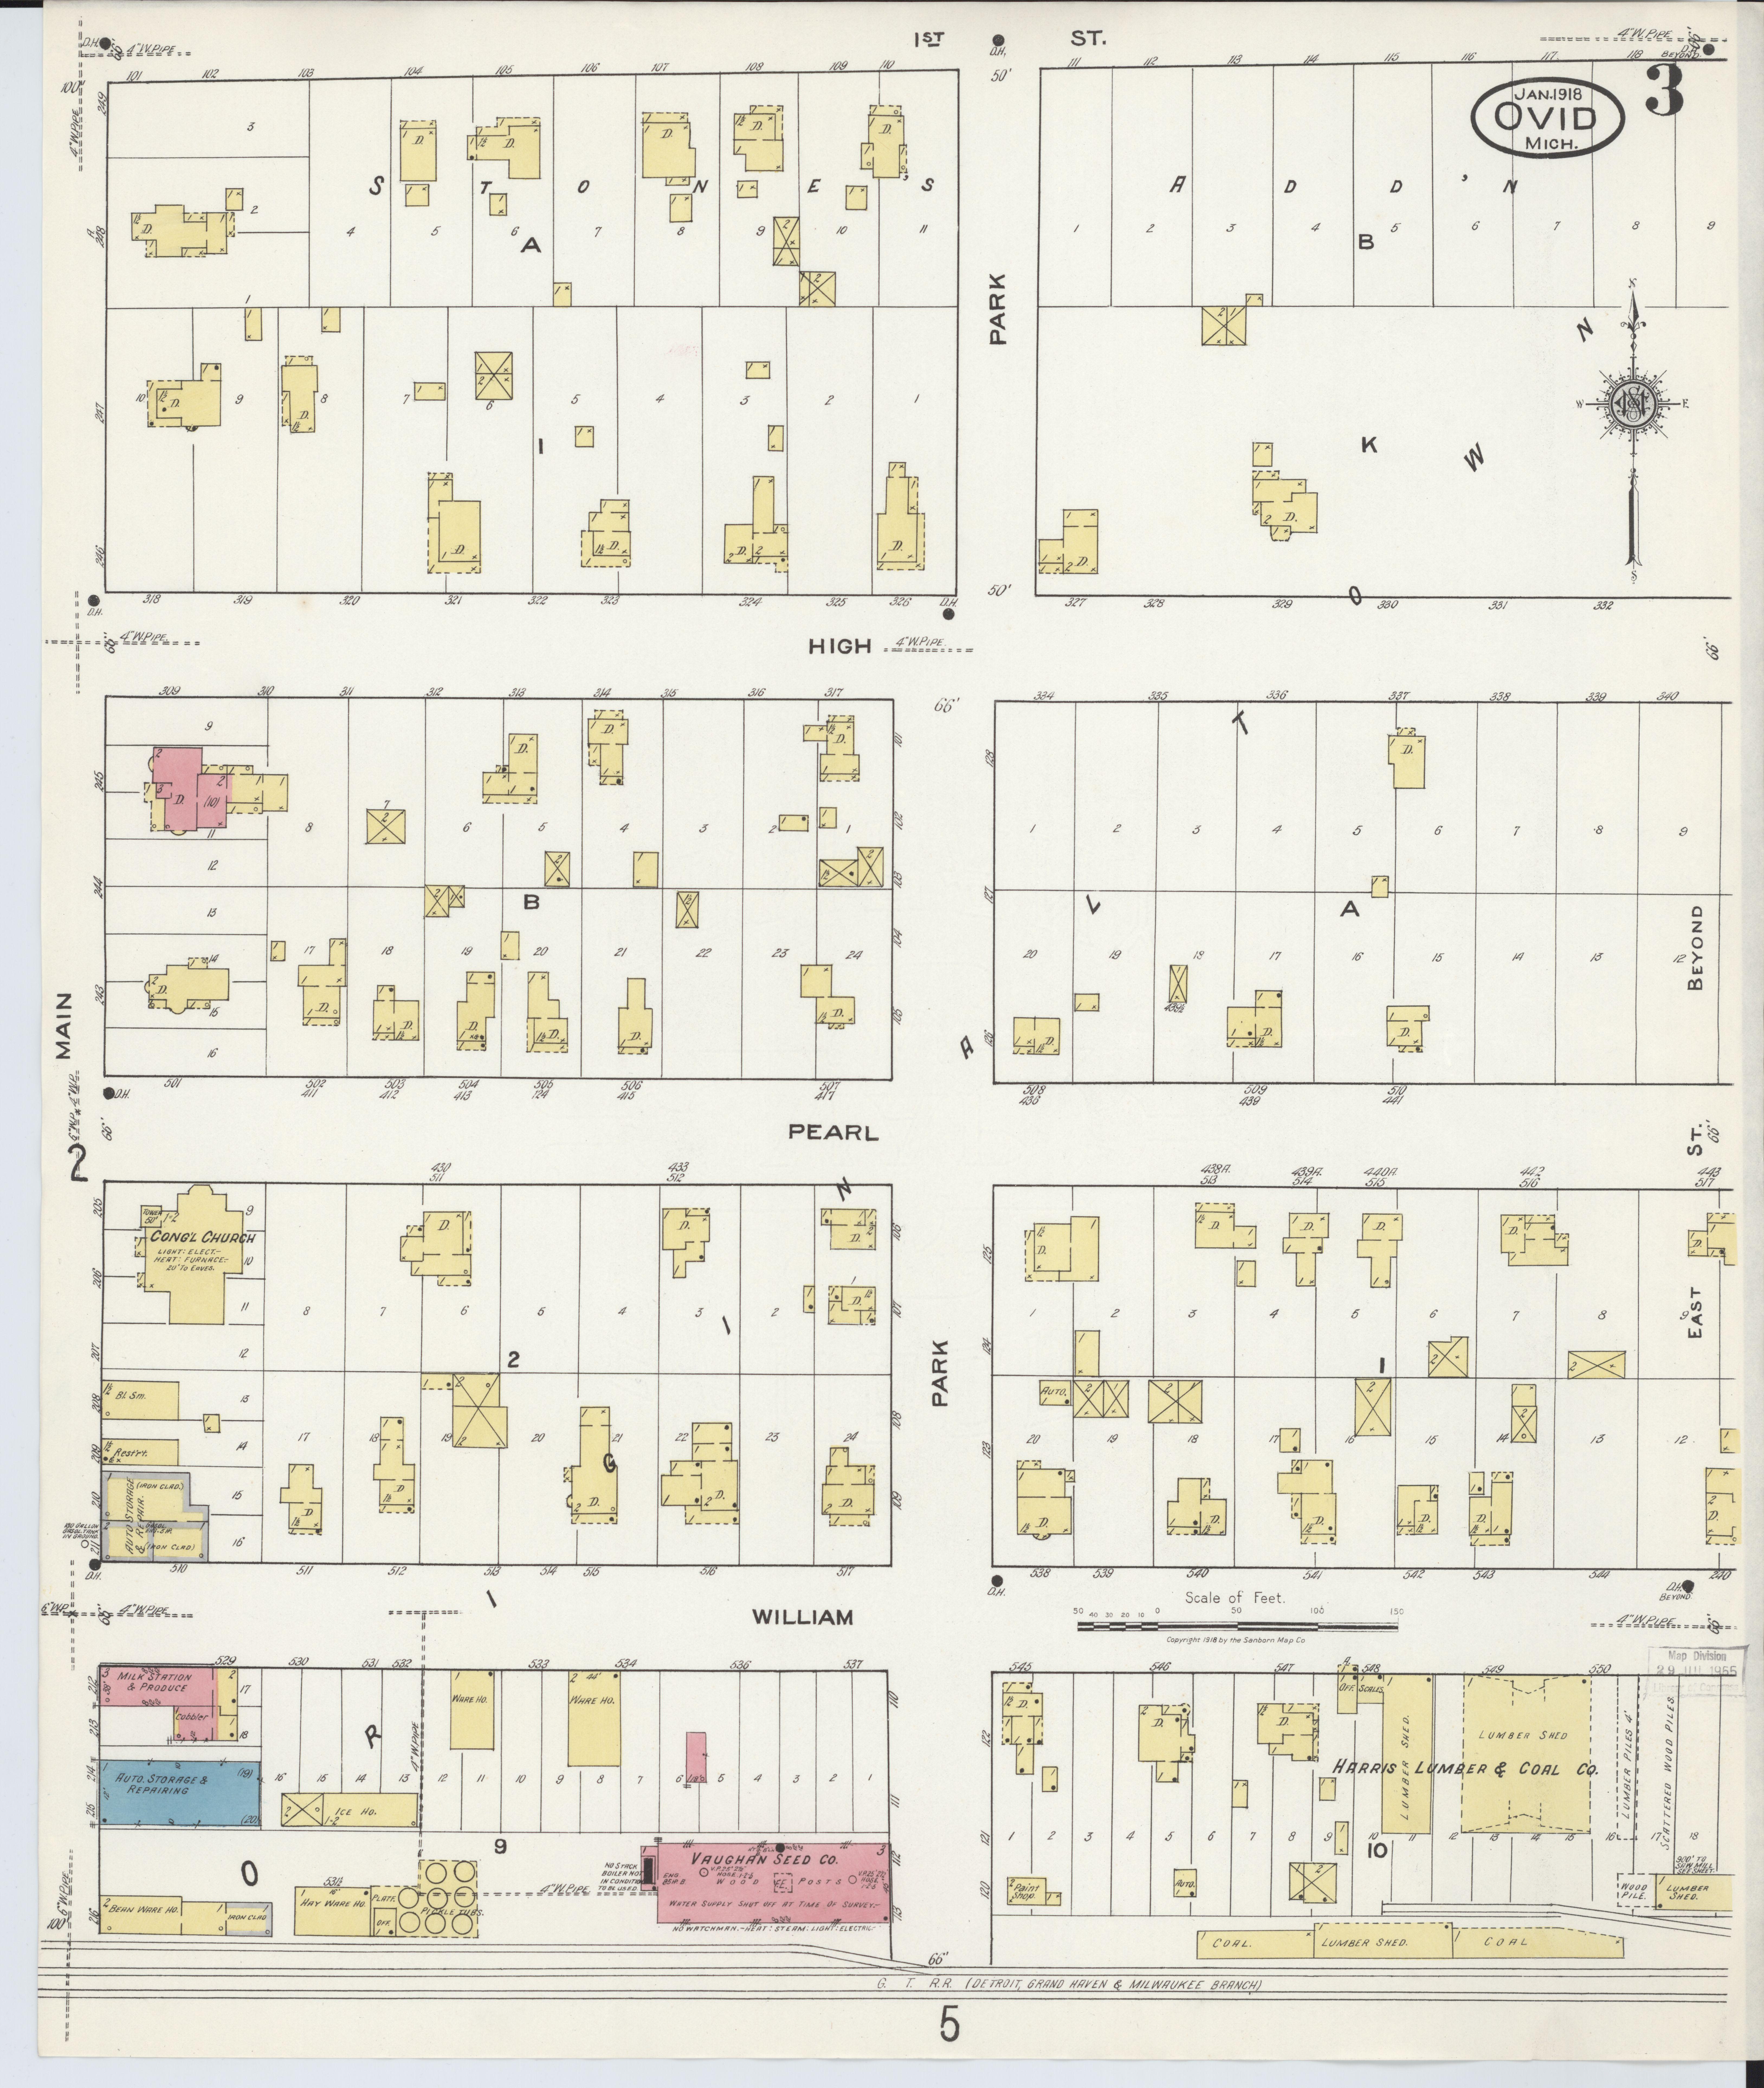 Ovid Michigan Map.File Sanborn Fire Insurance Map From Ovid Clinton County Michigan